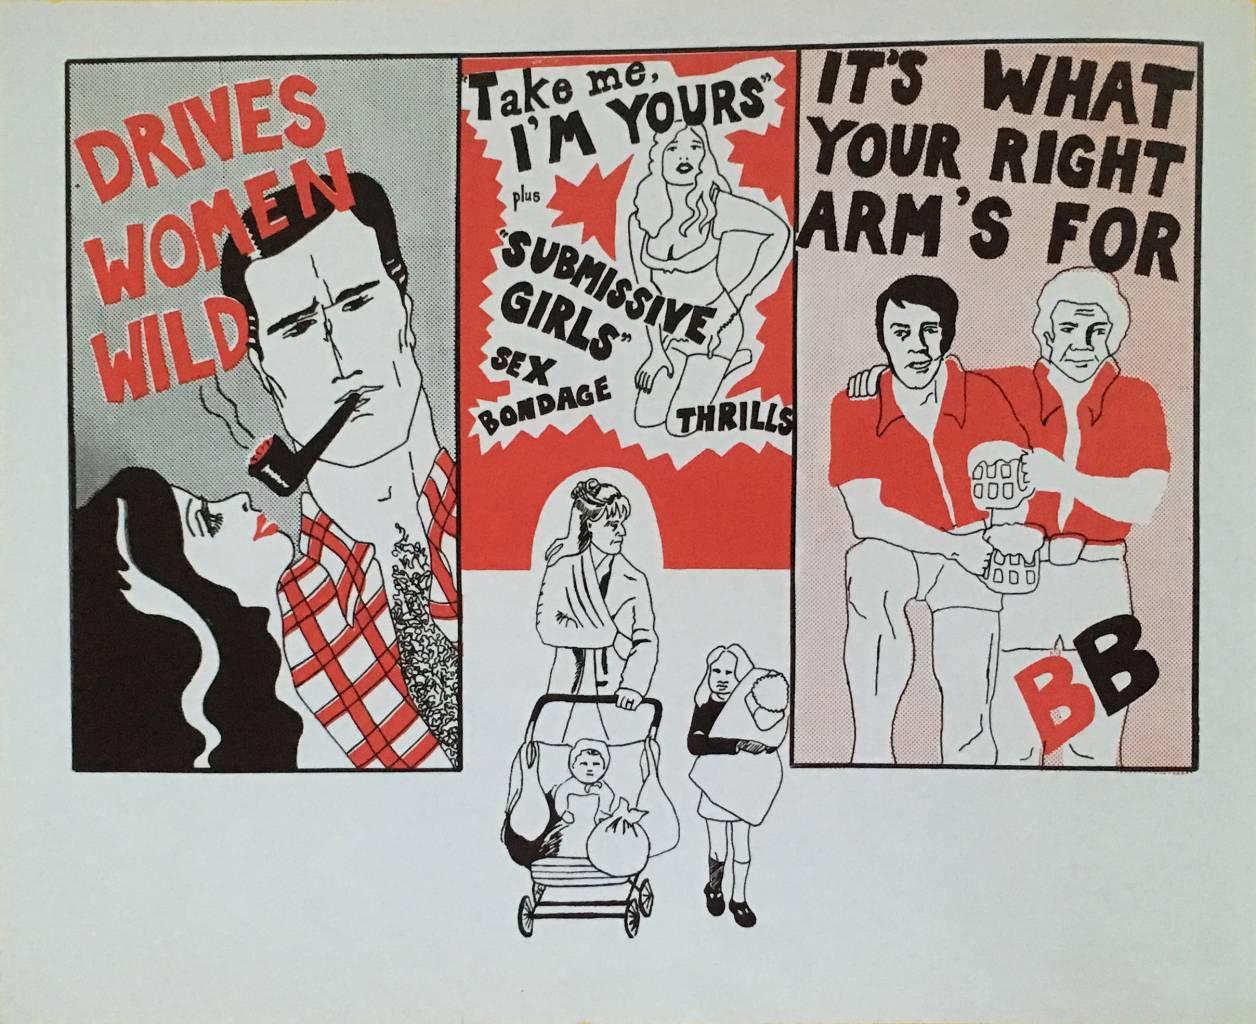 Drives-Women-WIld-768x626.jpg